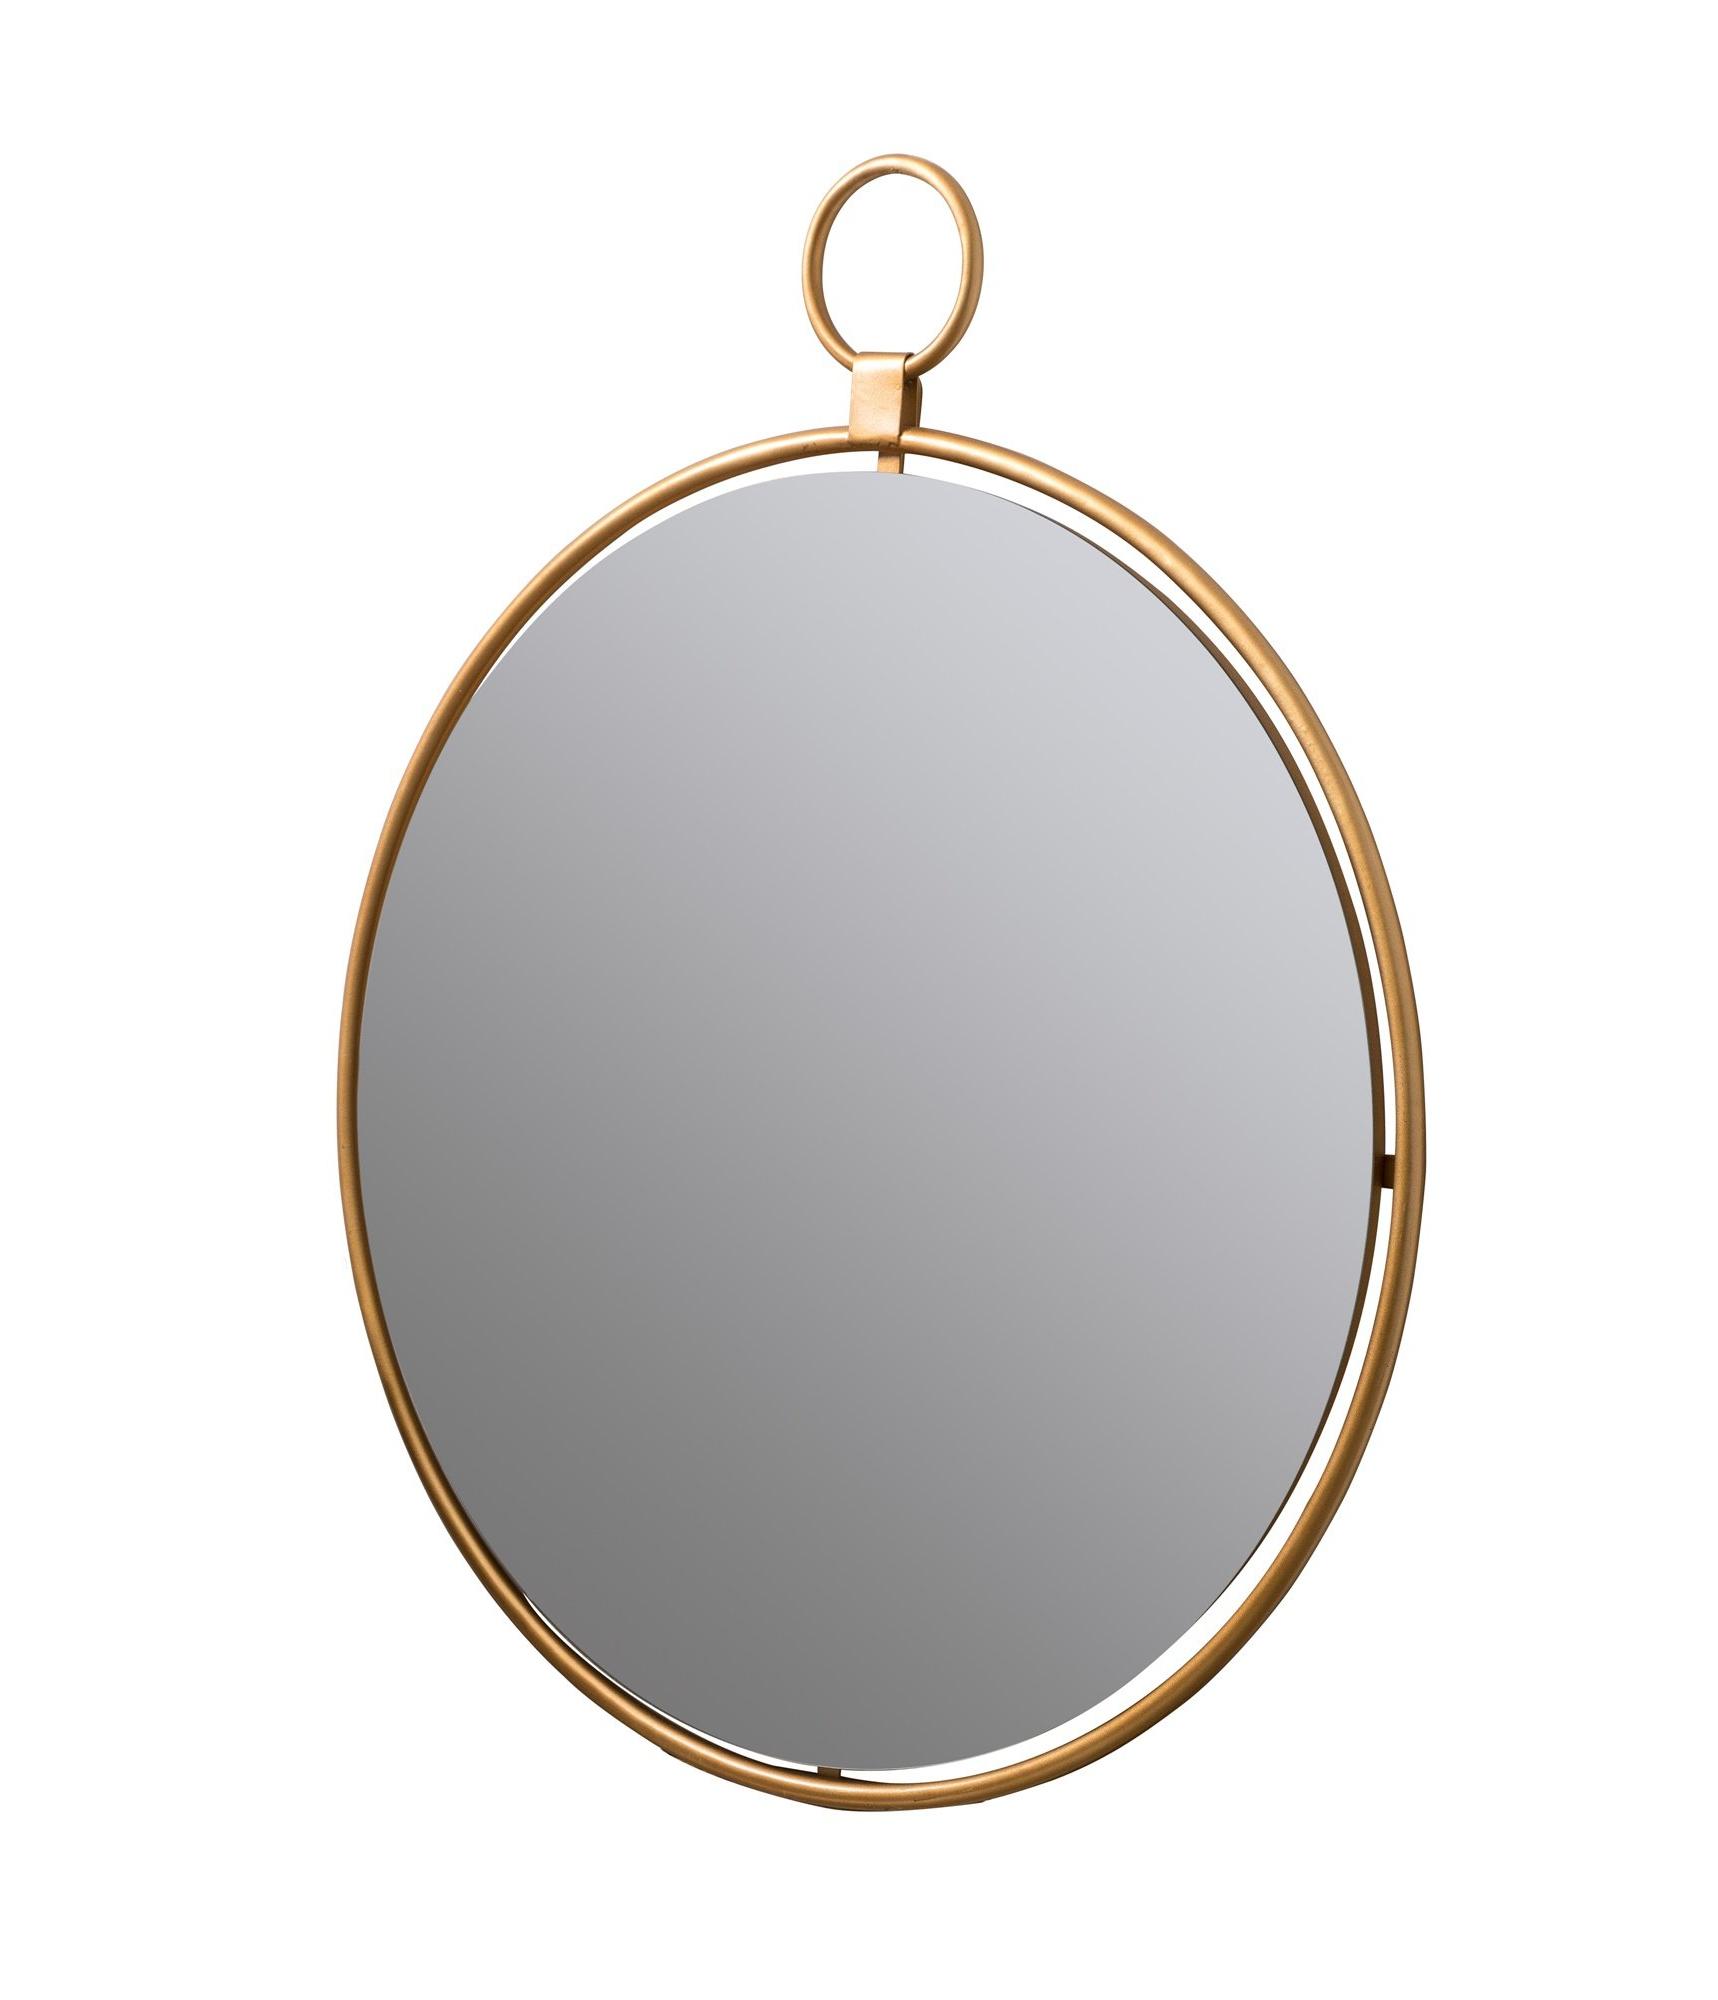 Well Known Tanner Accent Mirrors Regarding Matthias Round Accent Mirror (View 20 of 20)